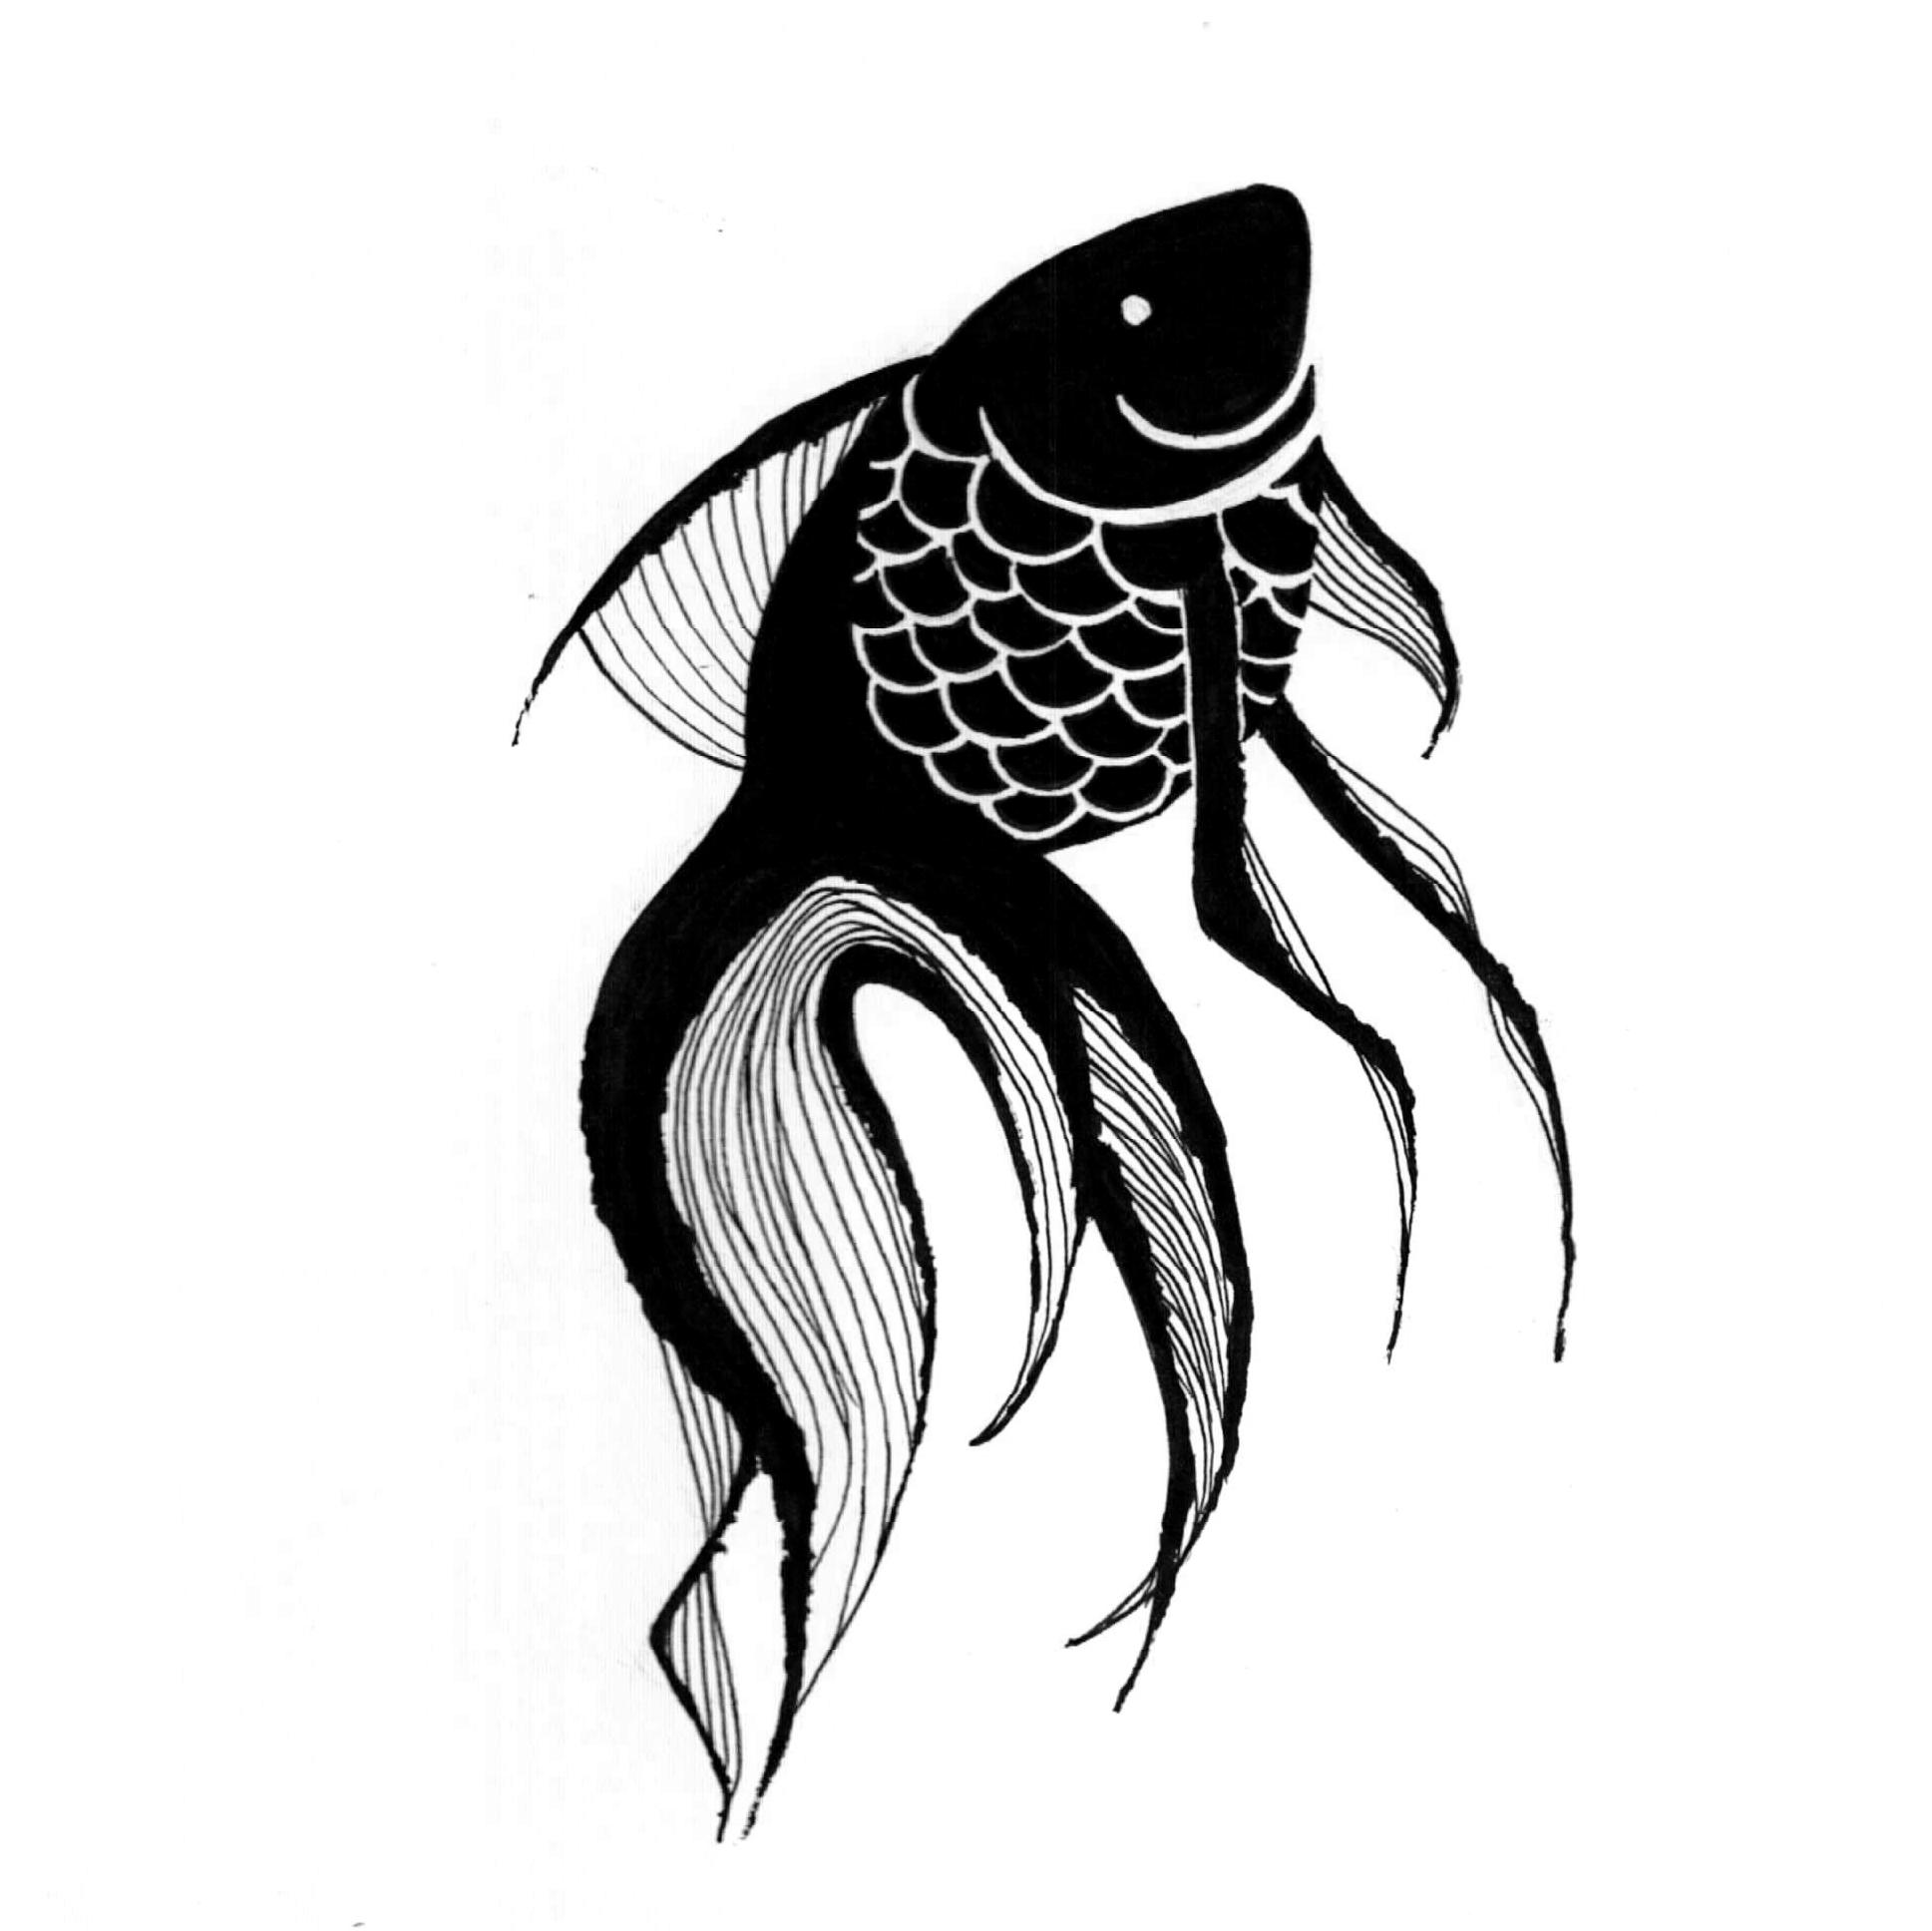 Day 30: Fish